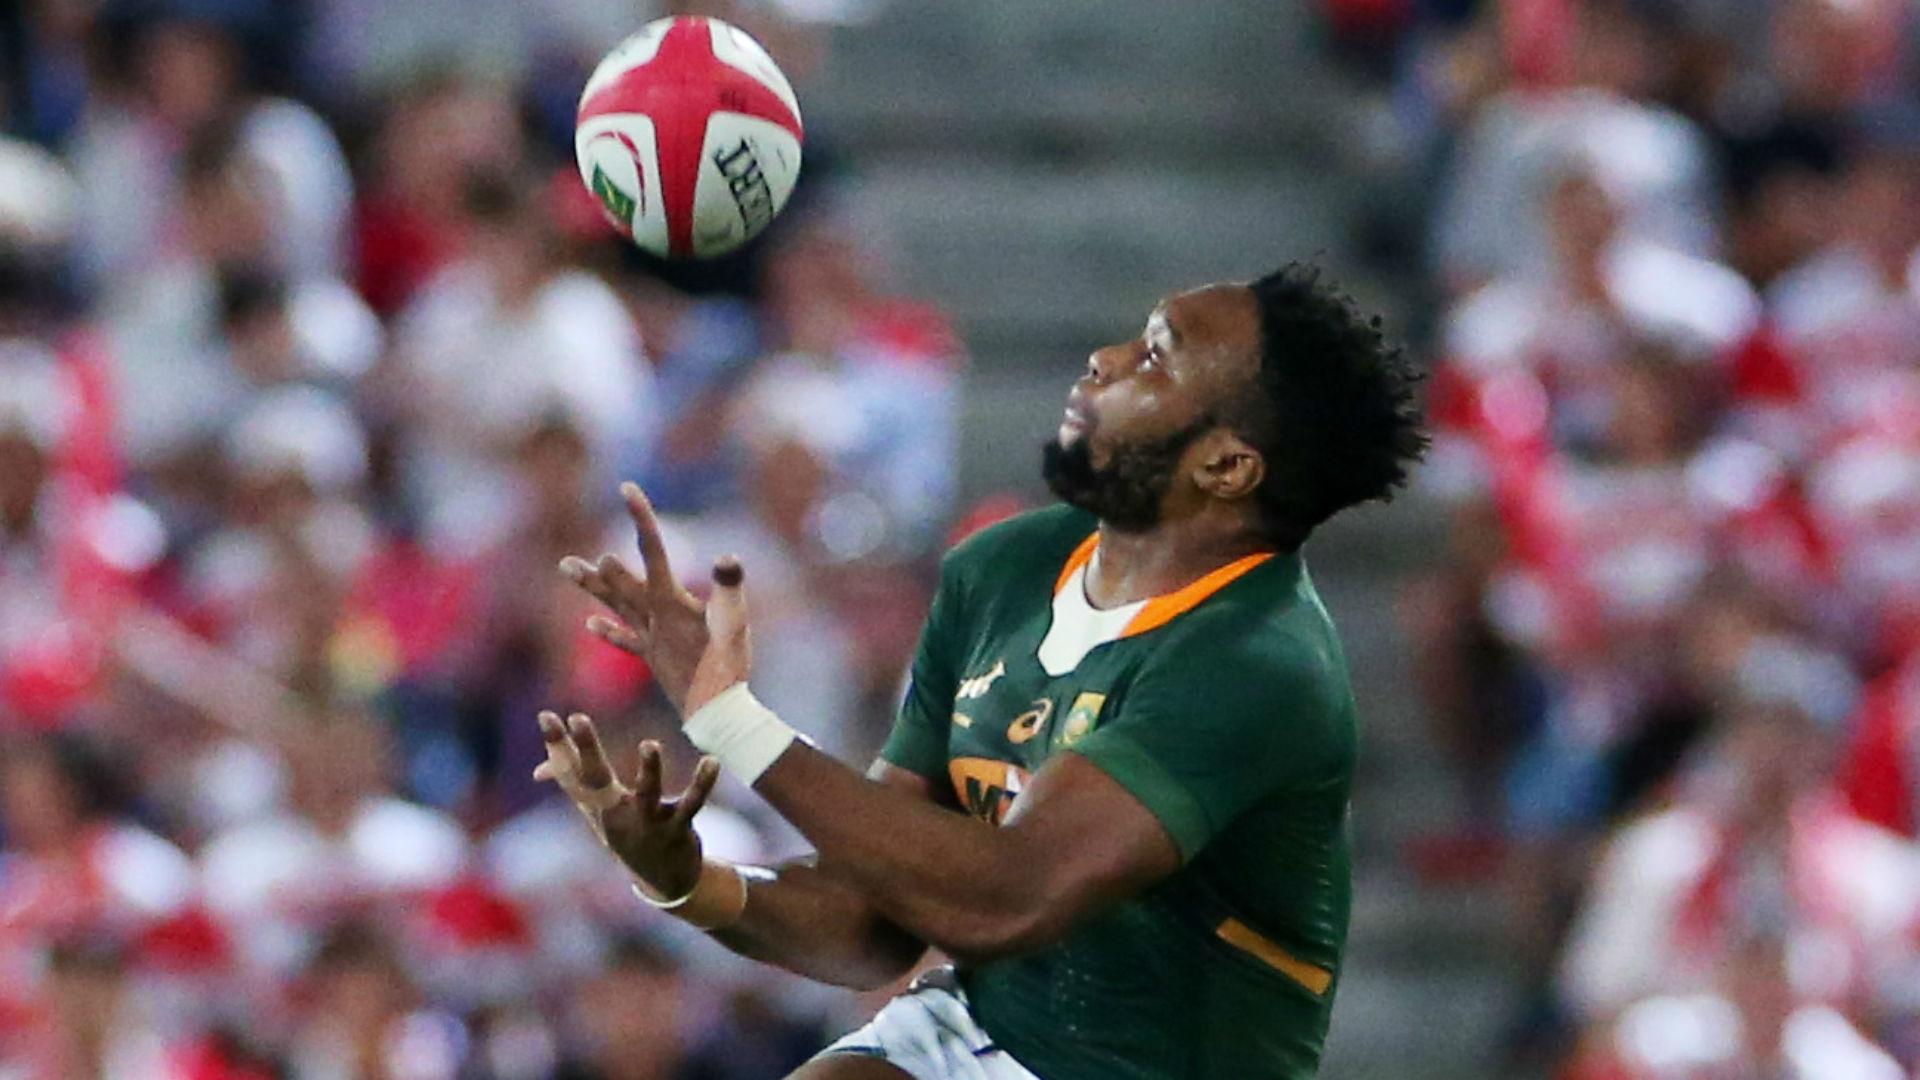 Rugby World Cup 2019: Kolisi urges fast start for Springboks against All Blacks